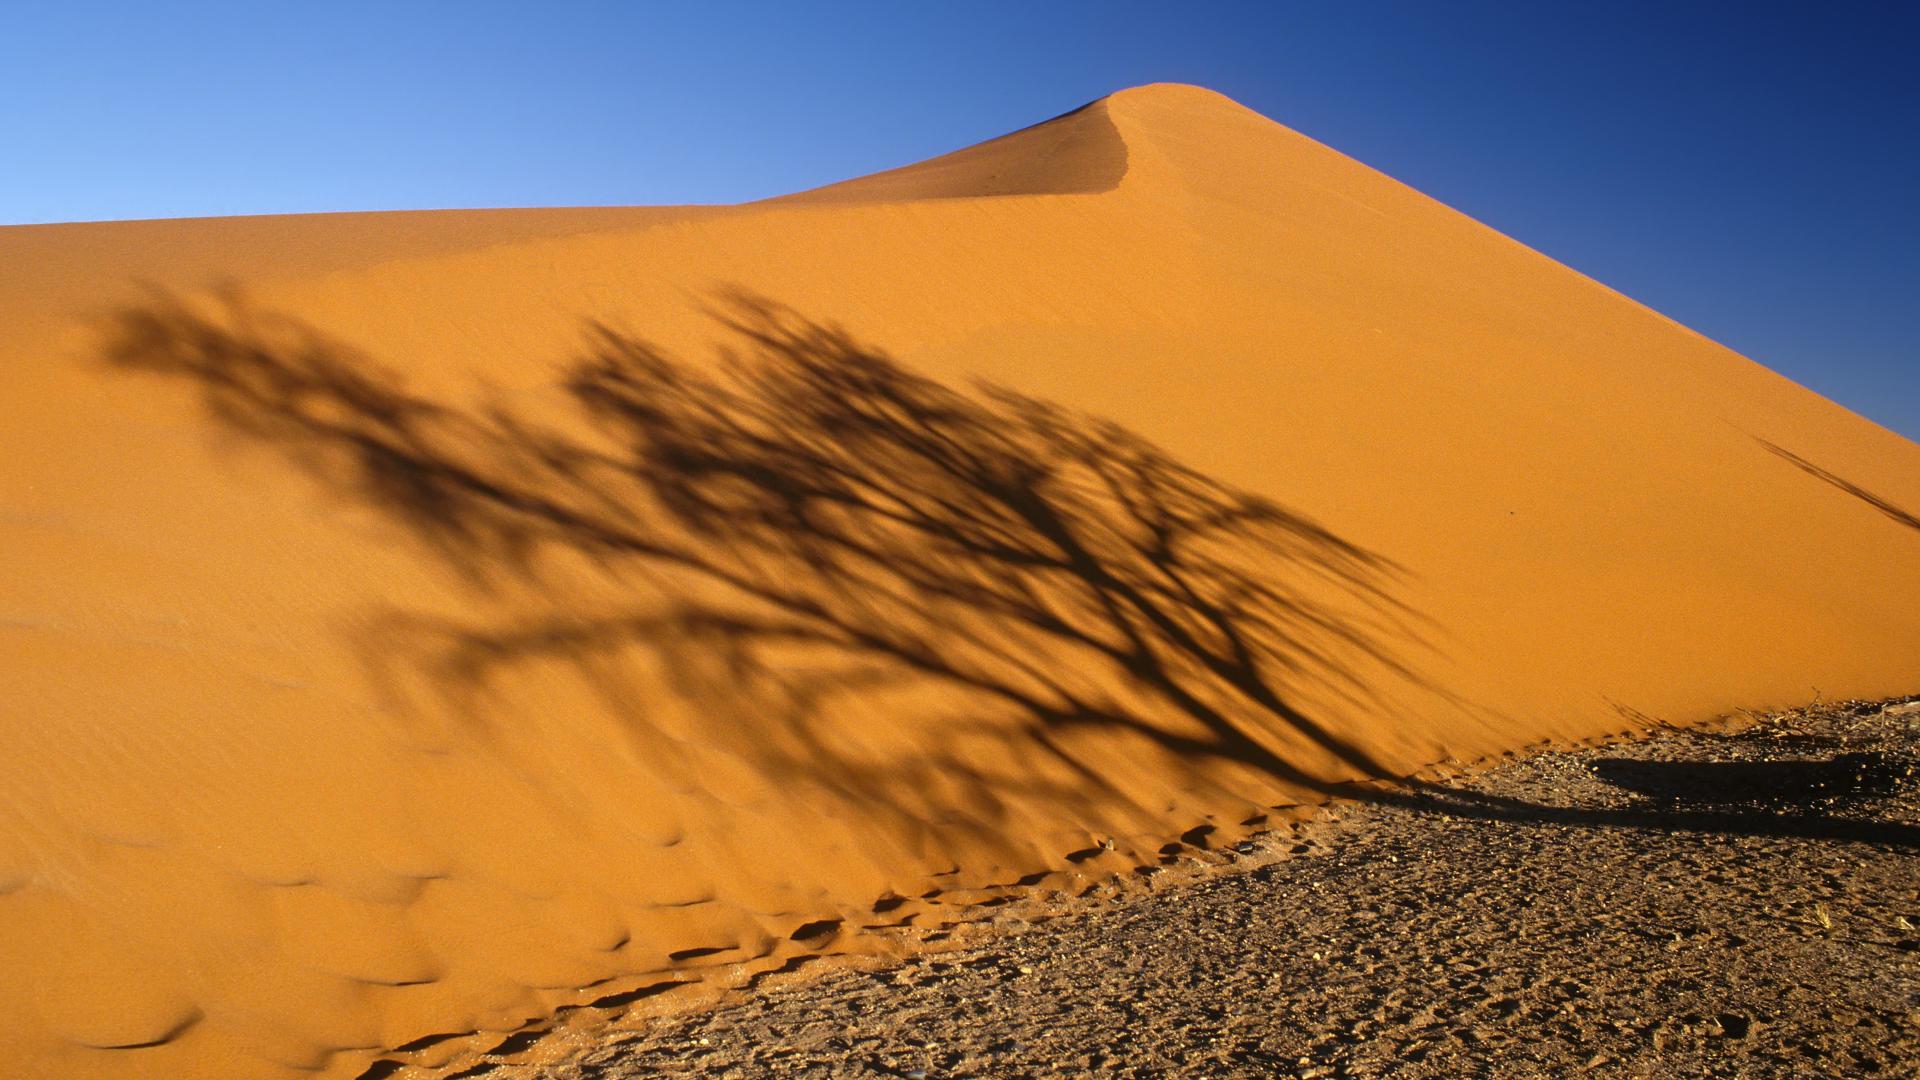 Desert Wallpapers 1920x1080 Full Hd 1080p Desktop Backgrounds